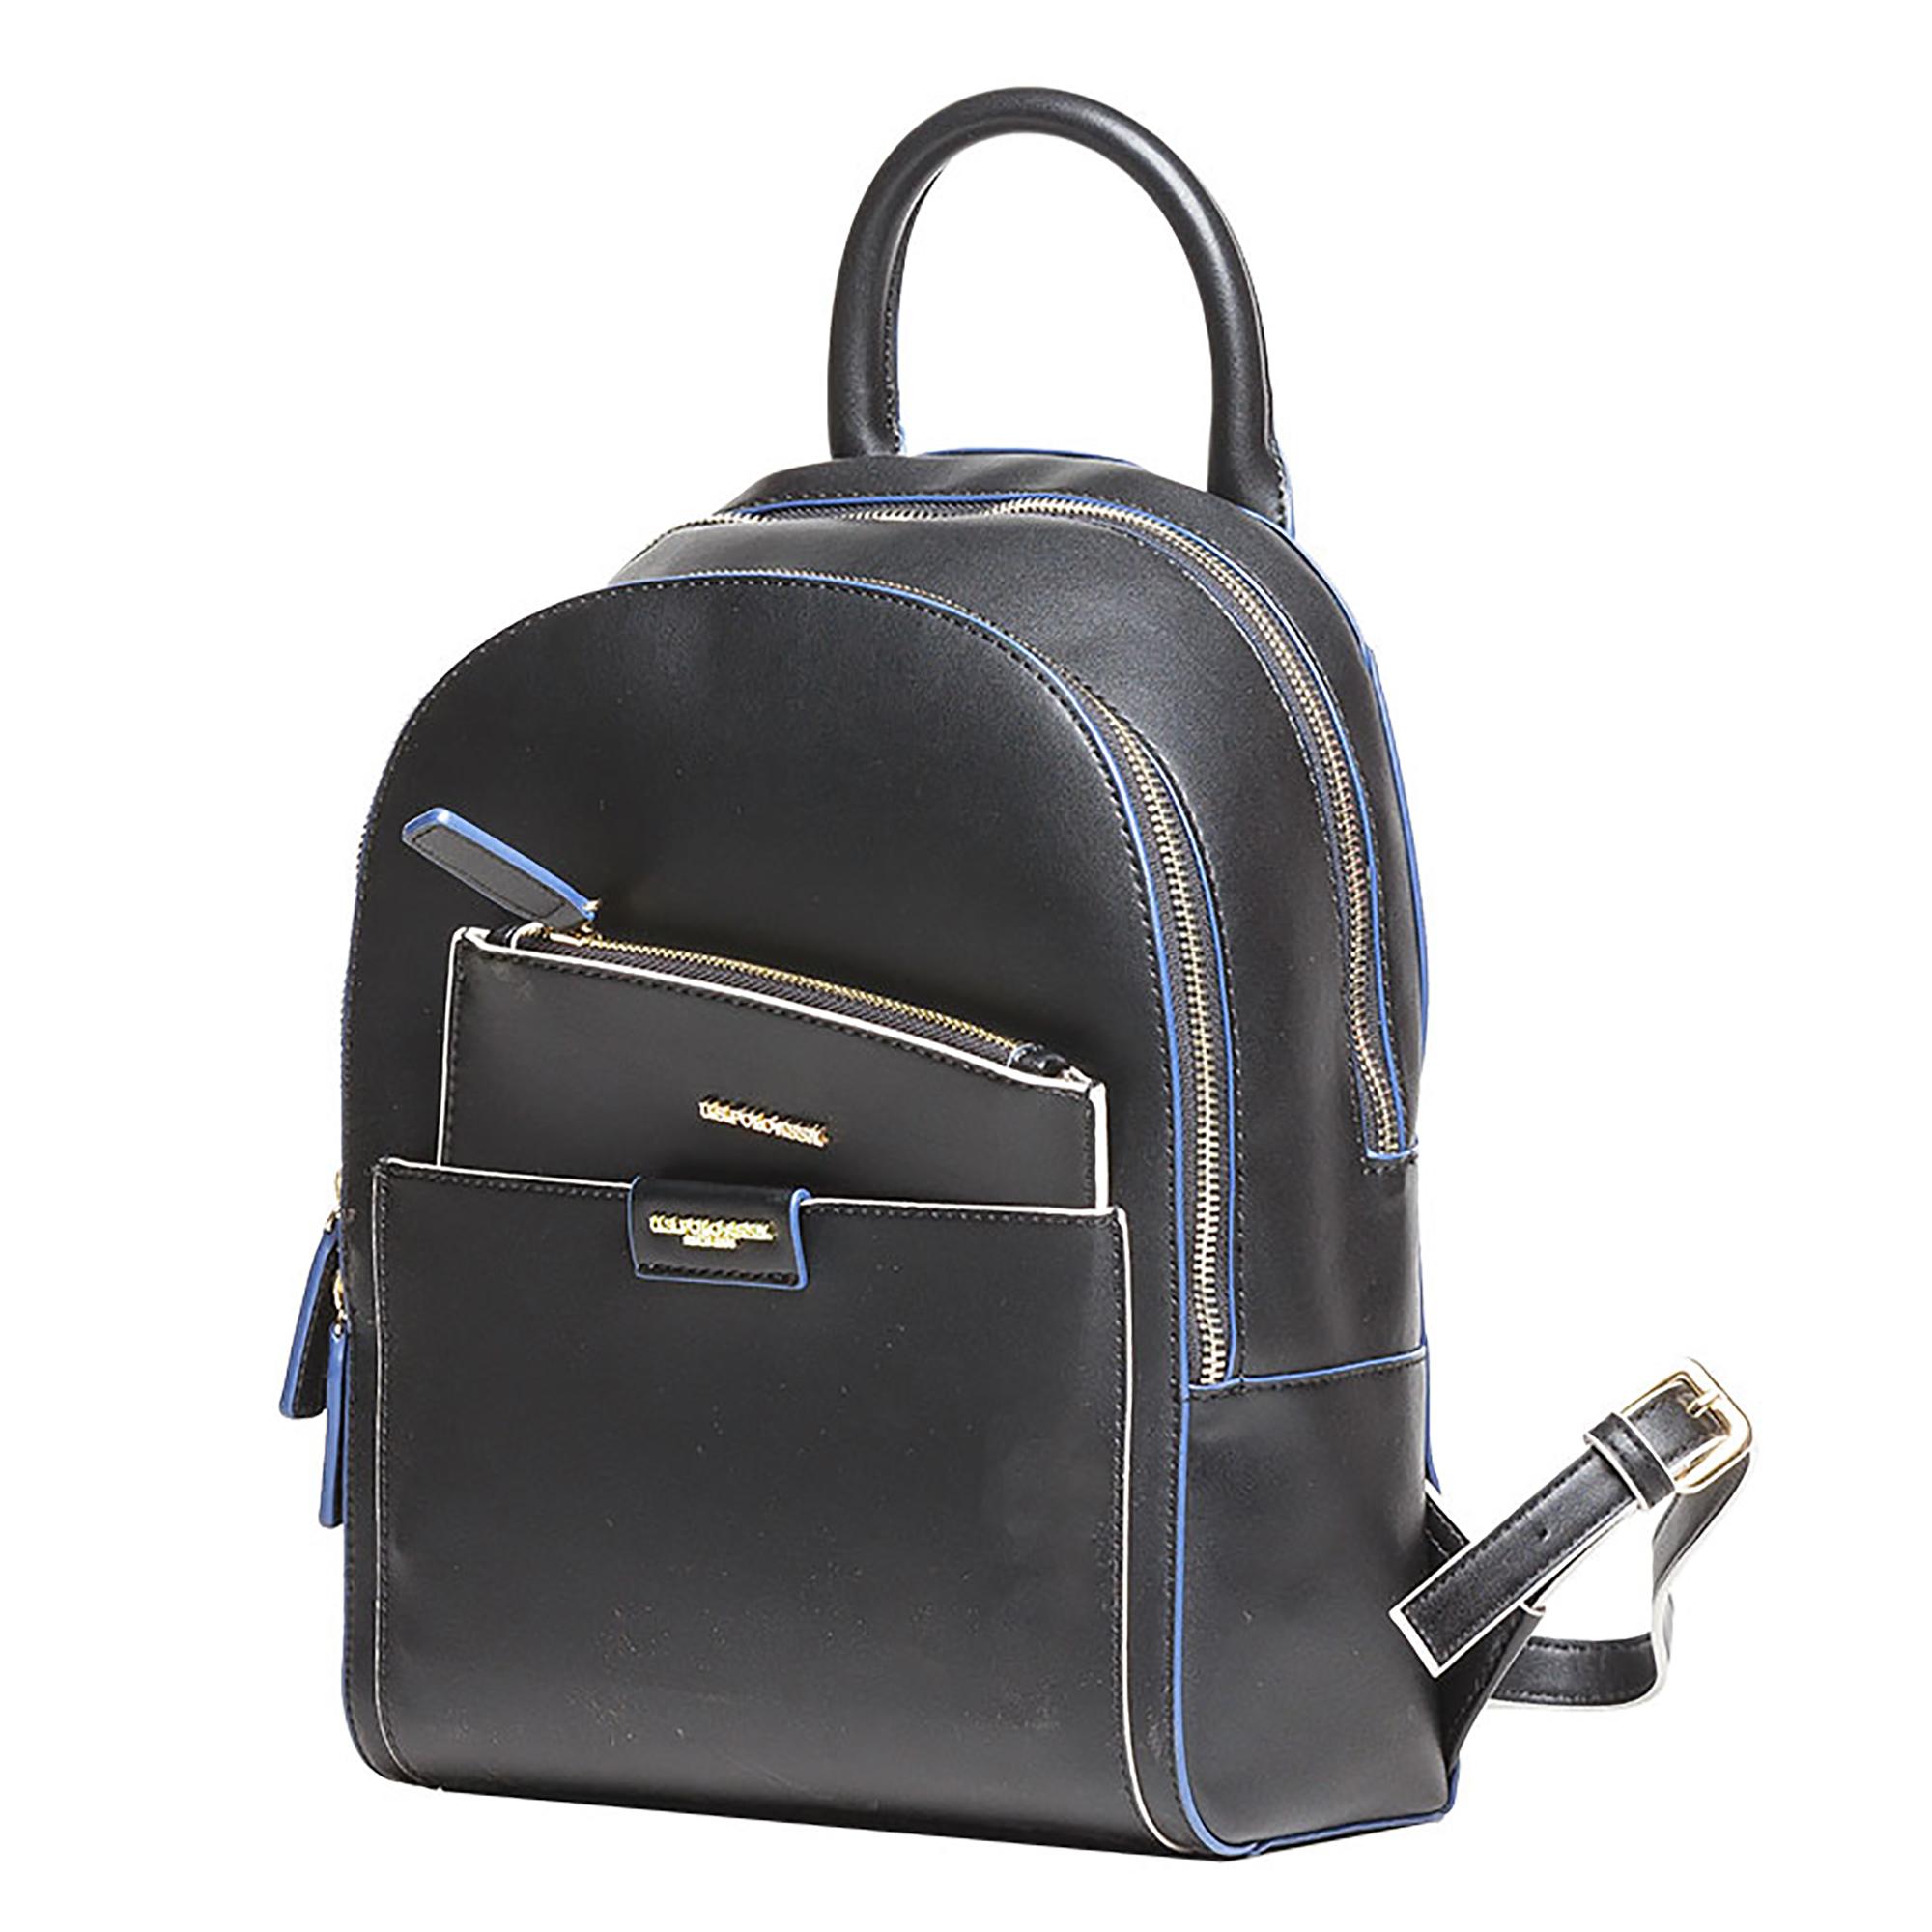 NEW-US-Polo-Assn-Sheridan-Womens-Fashion-Backpack-Adjustable-Shoulder-Strap thumbnail 5